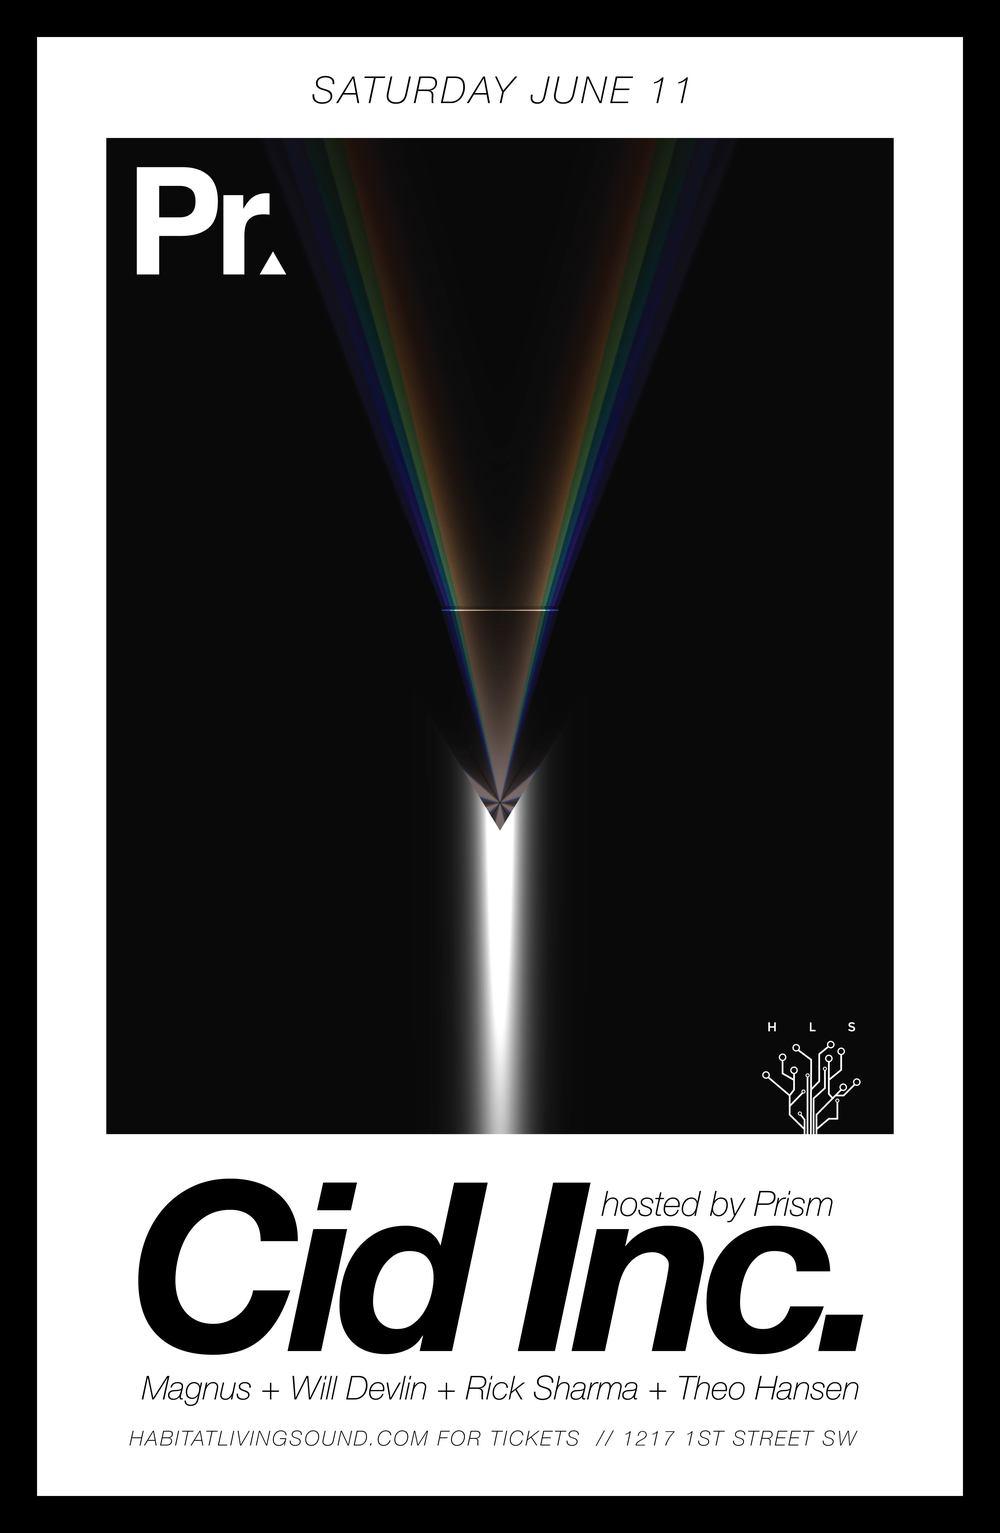 CID-INC-habitat-living-sound.jpeg